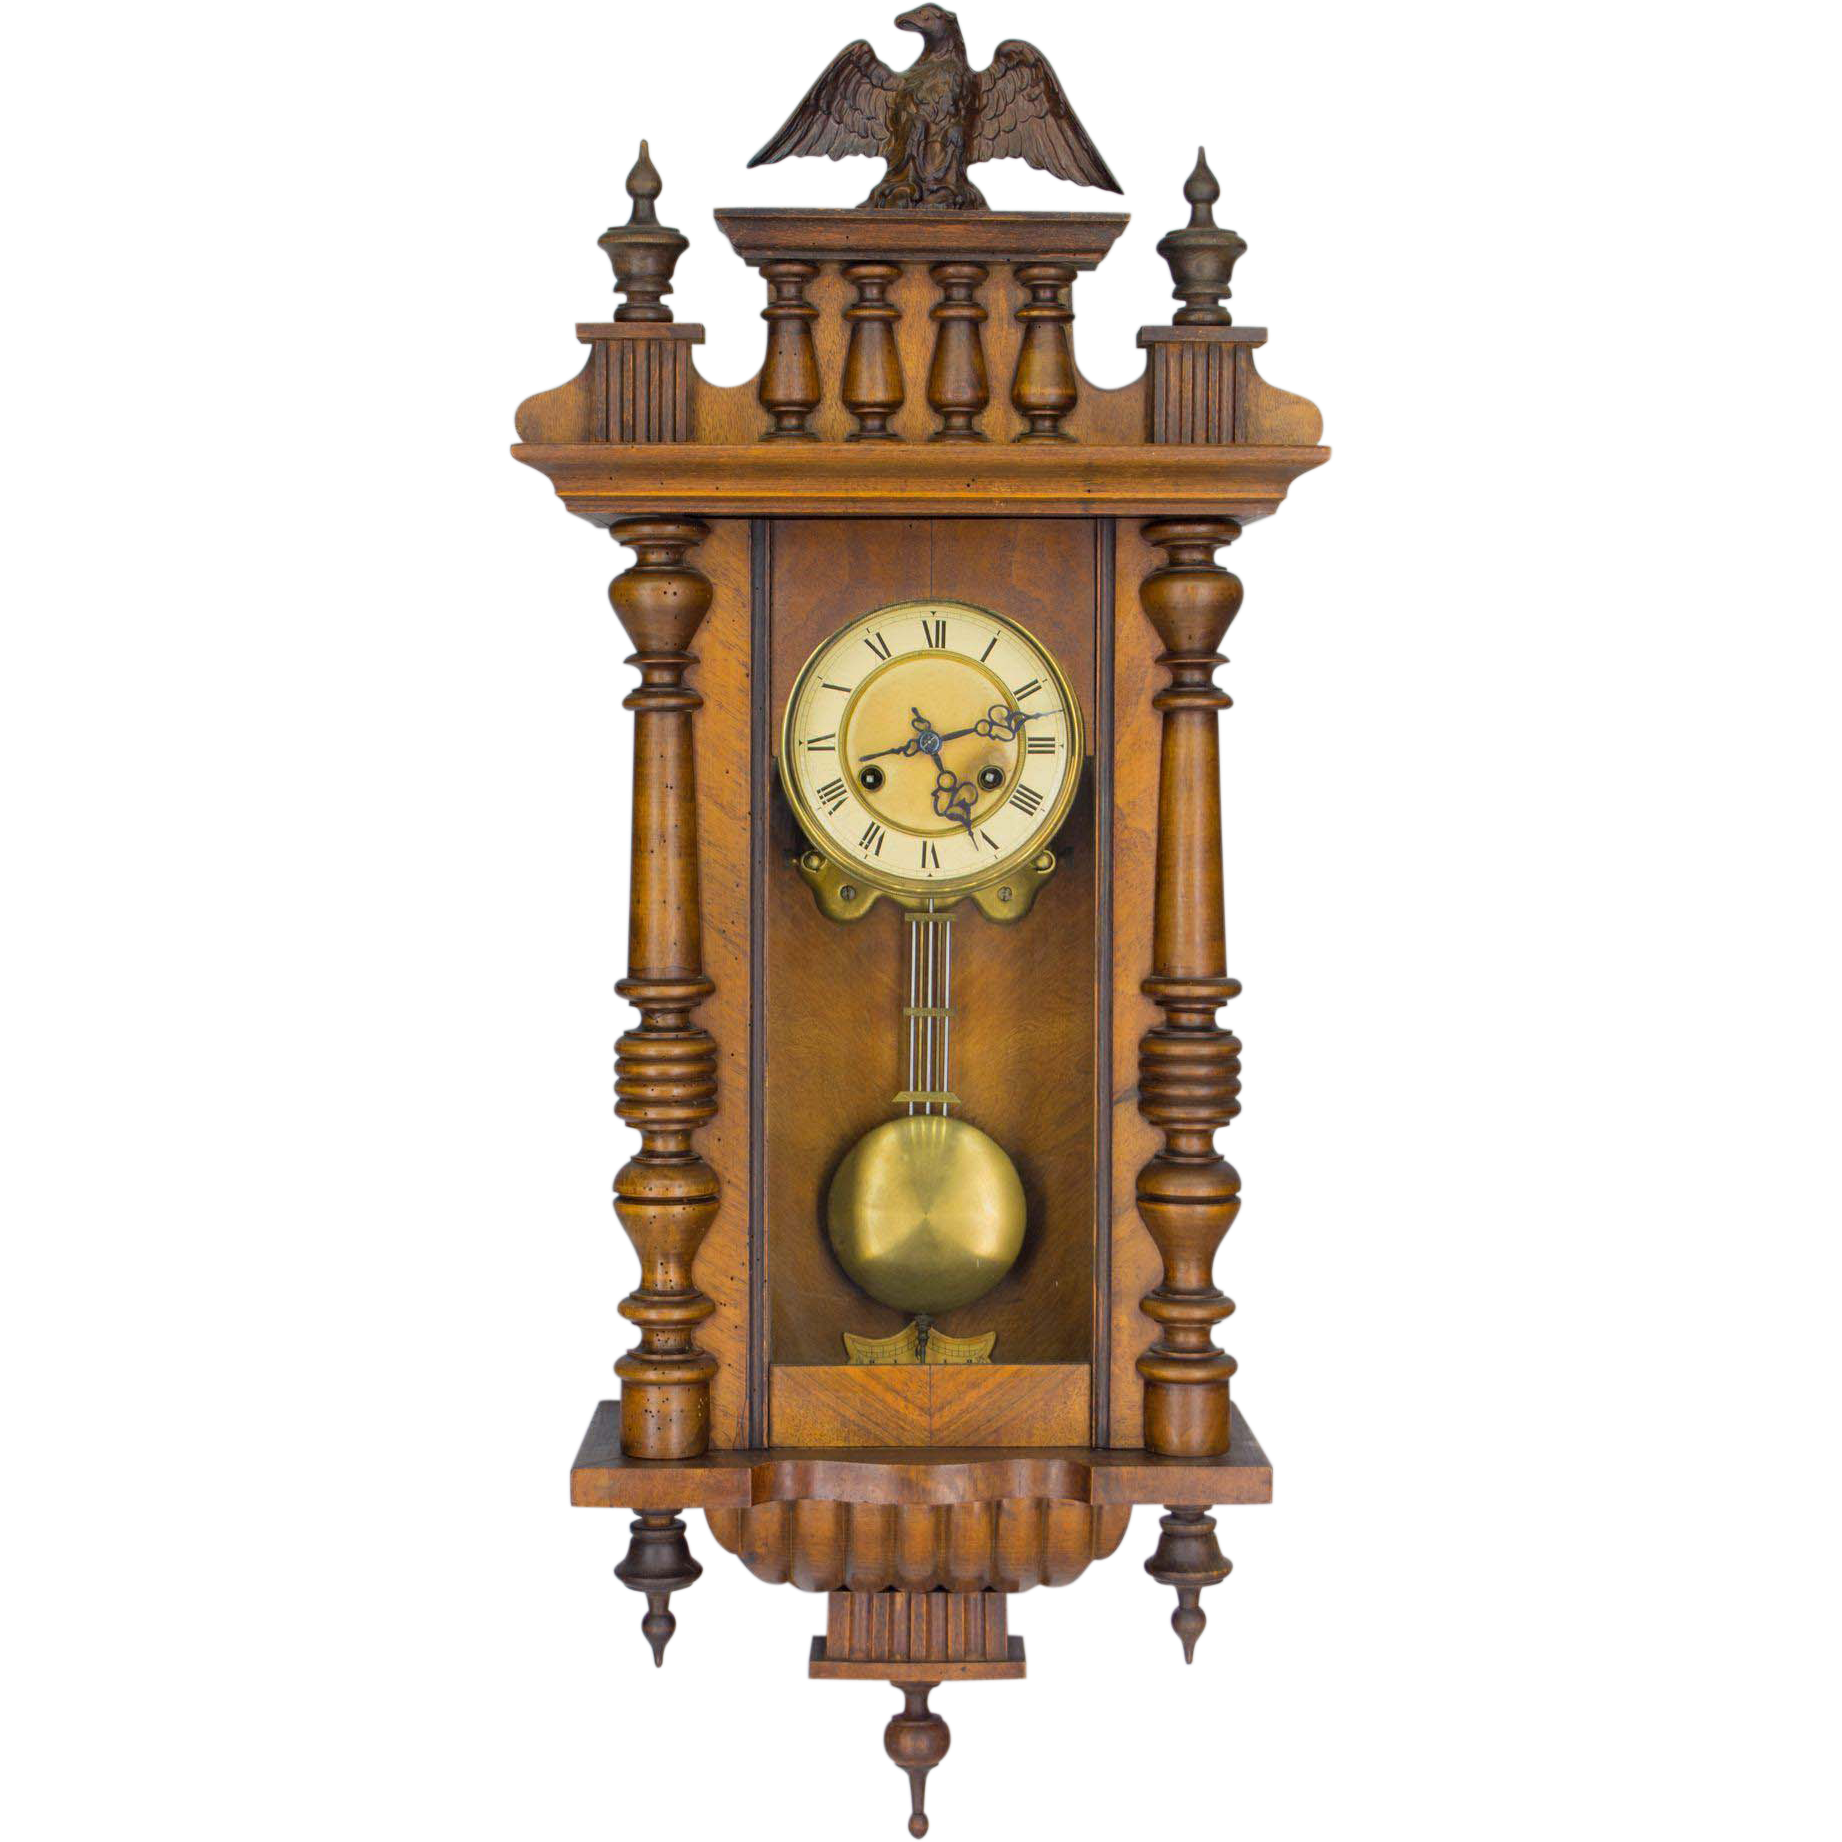 Swiss Regulator Or Wall Clock From Ofleury On Ruby Lane